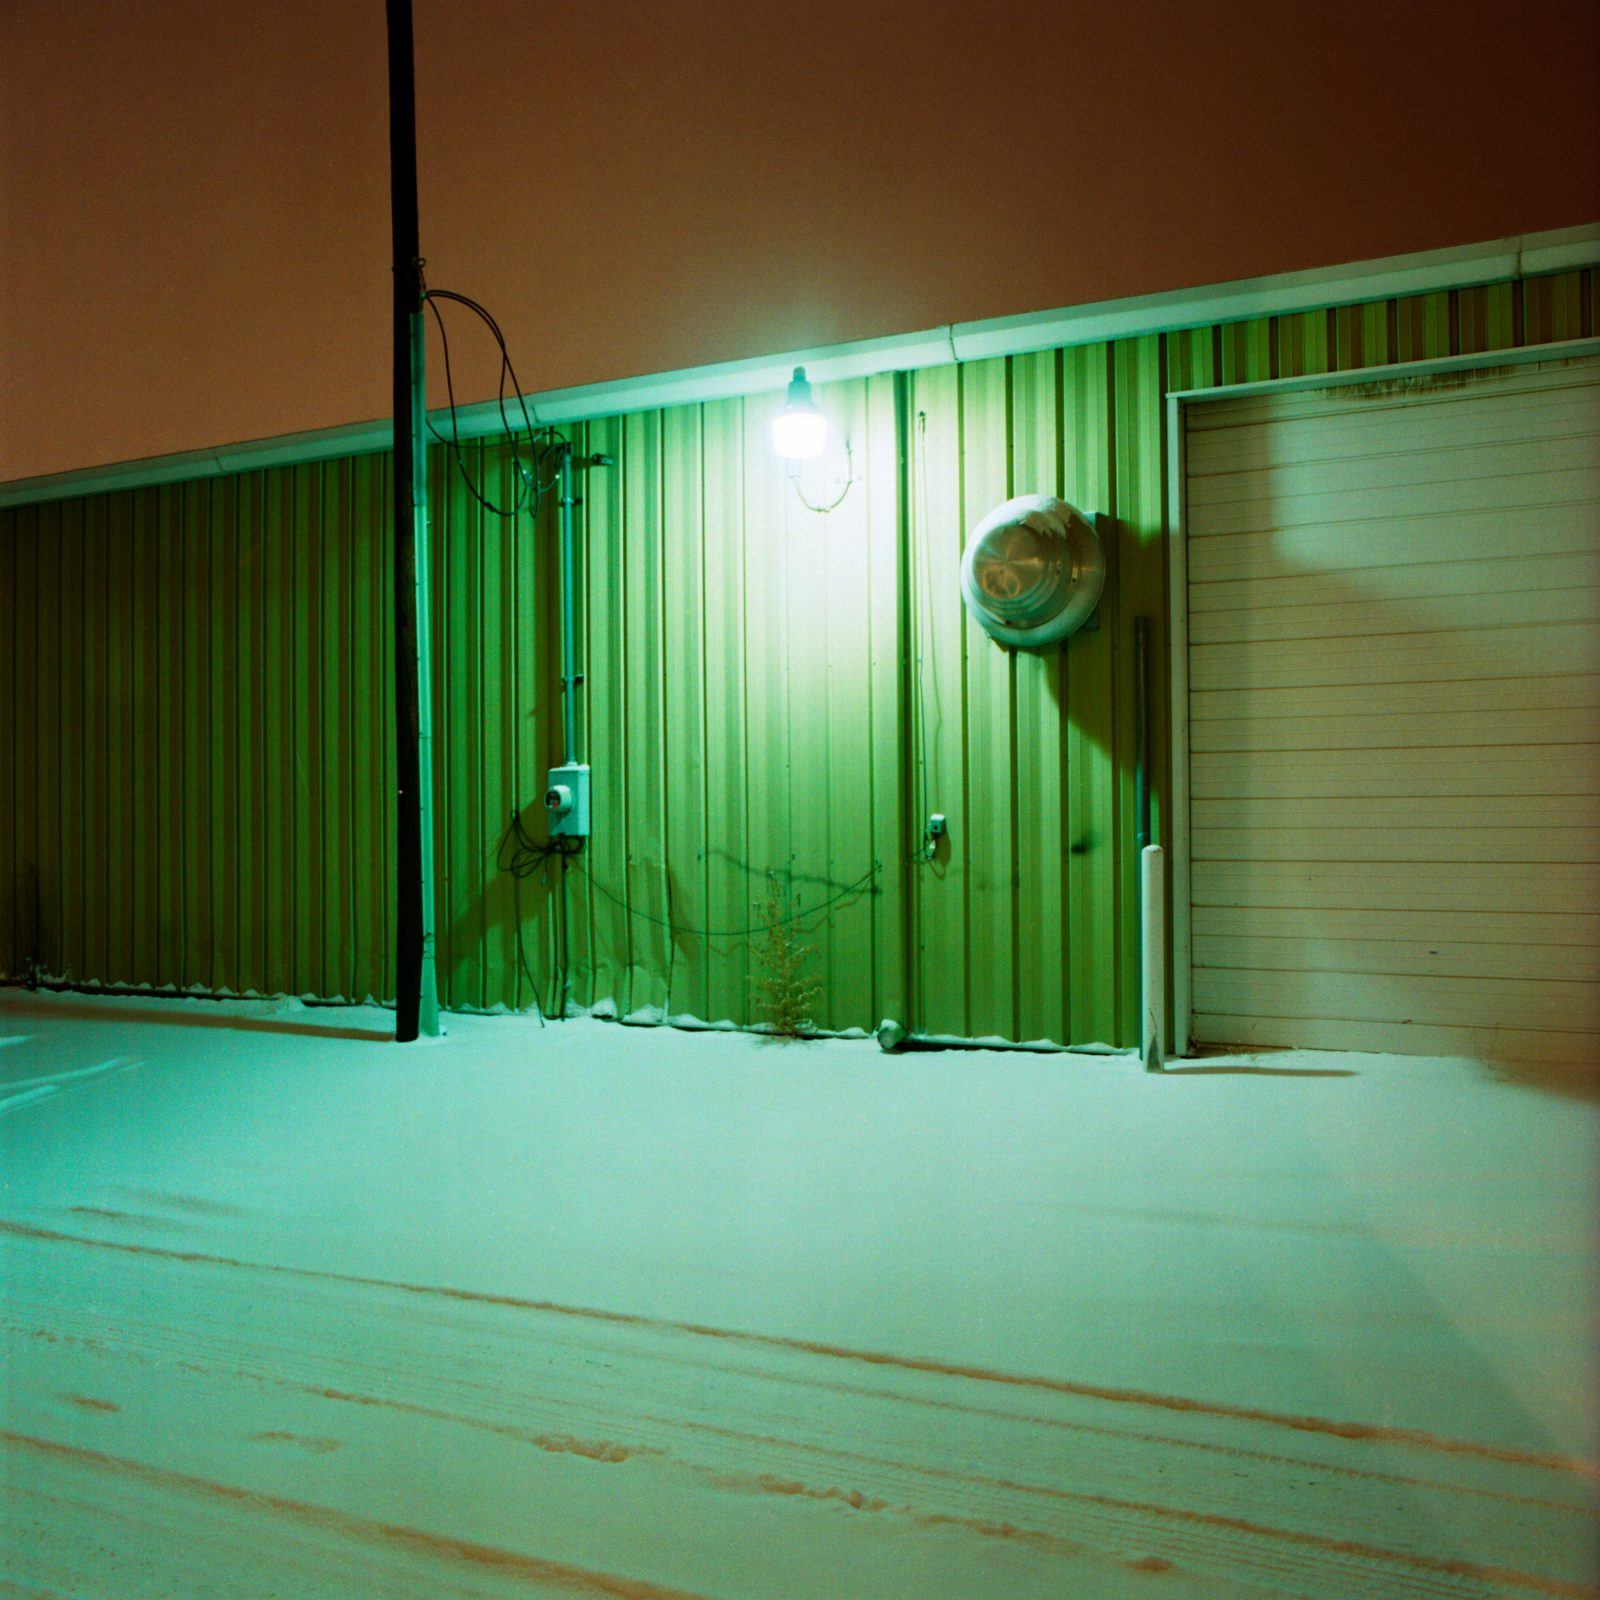 Denver industrial wall during a snowstorm - December 28, 2009